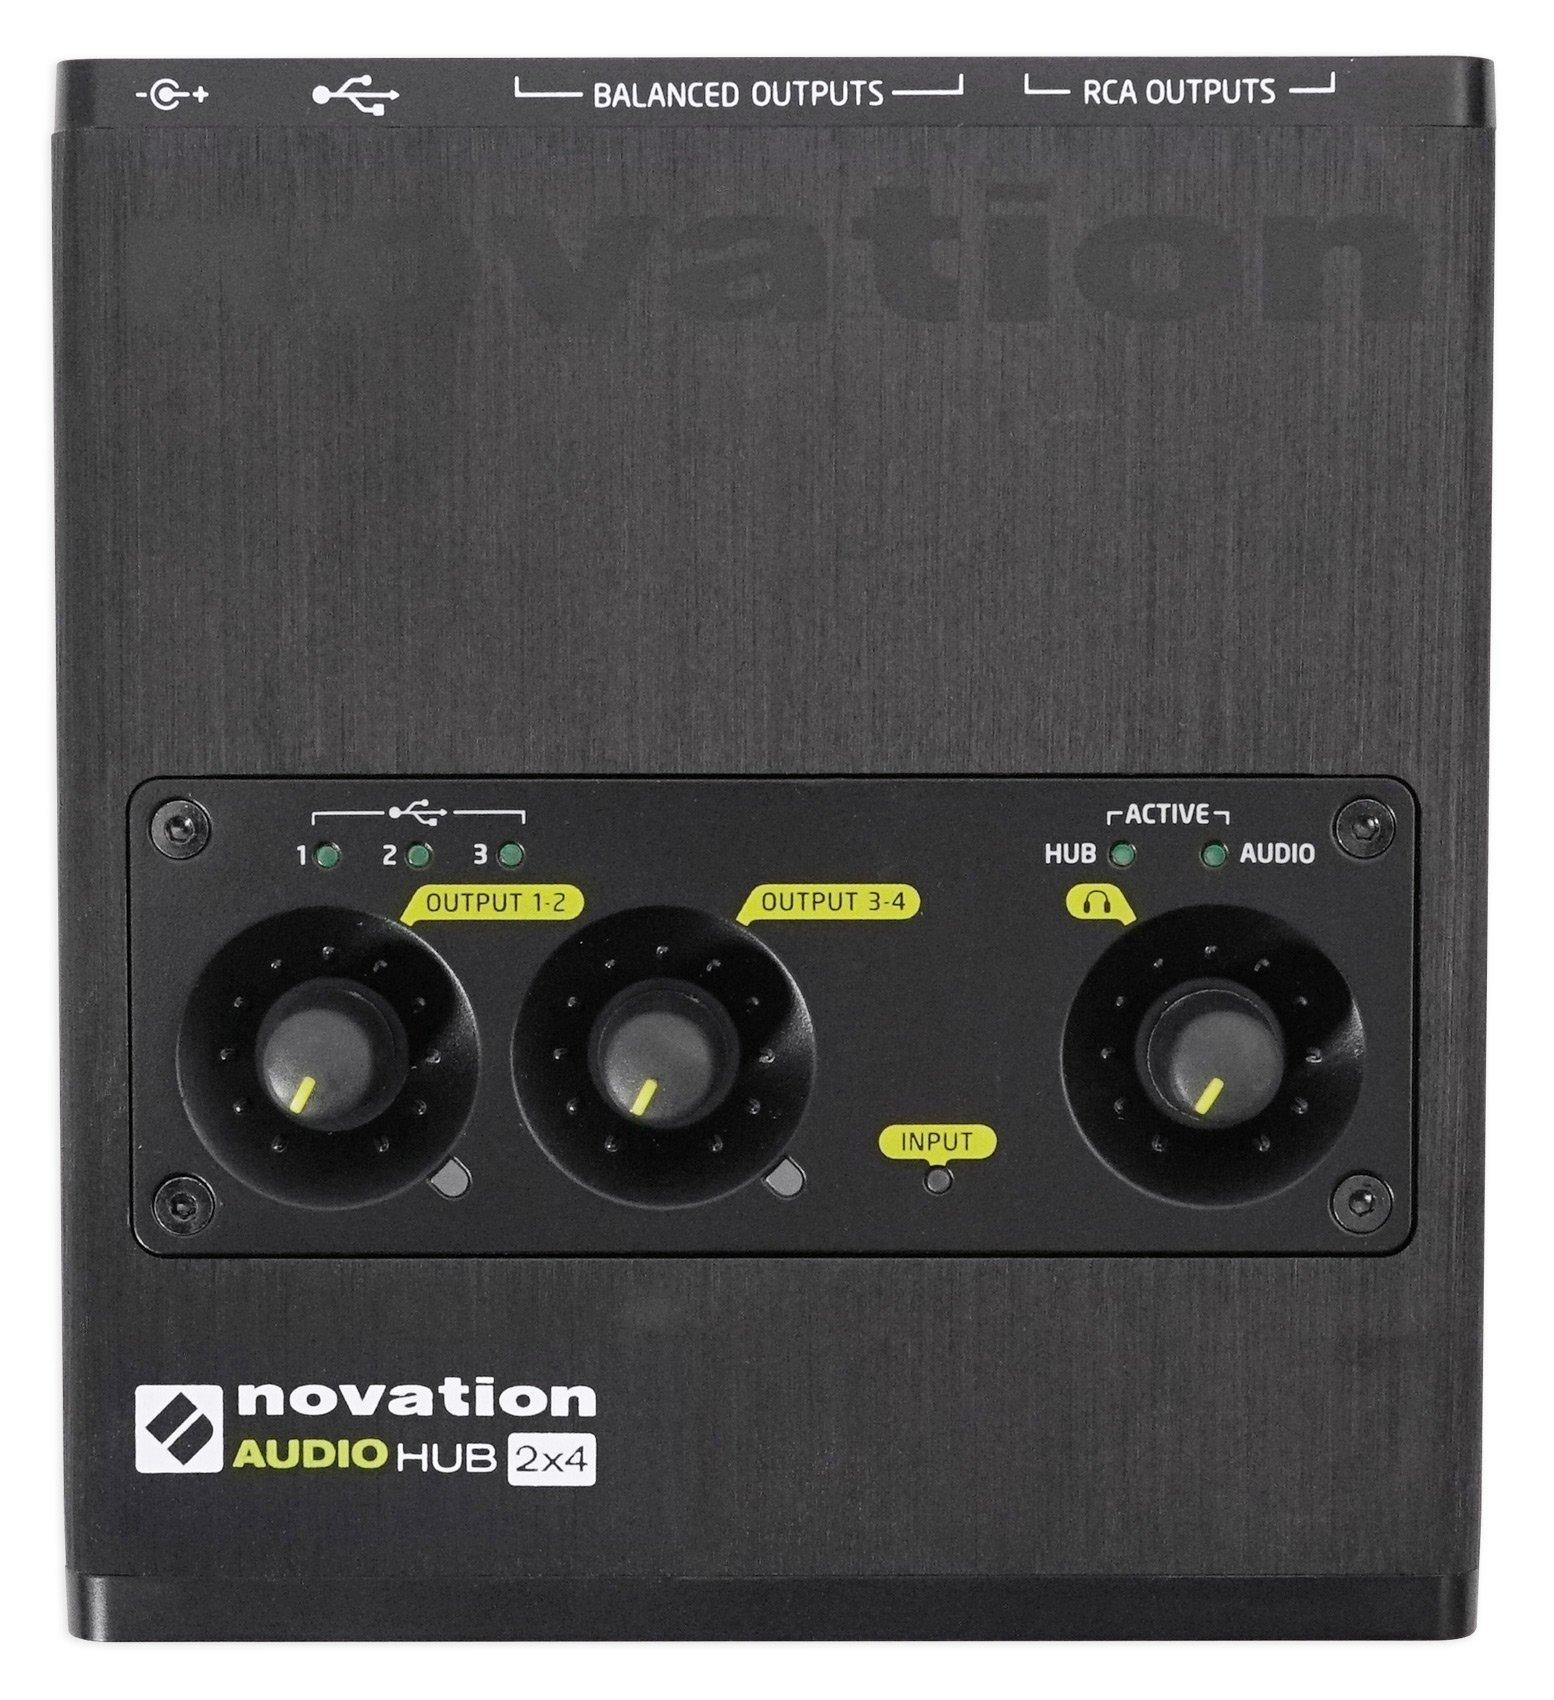 Novation Audiohub 2x4 Combined Audio Interface and USB 2.0 Hub